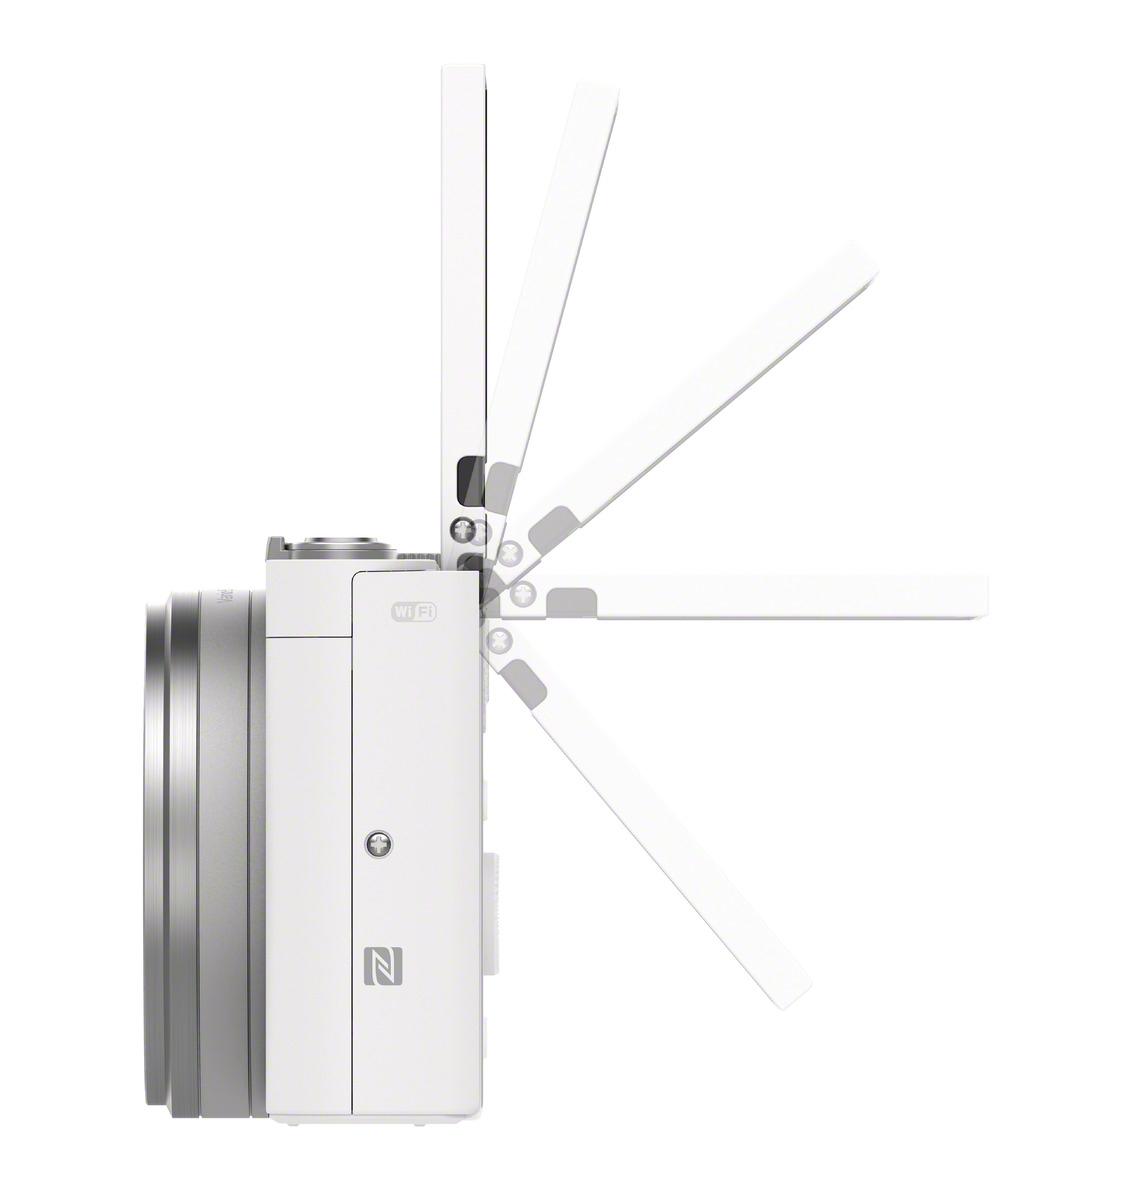 Sony Cyber Shot Dsc Hx90 Hx90v I Wx500 Digital Camera With 180 Degrees Tiltable